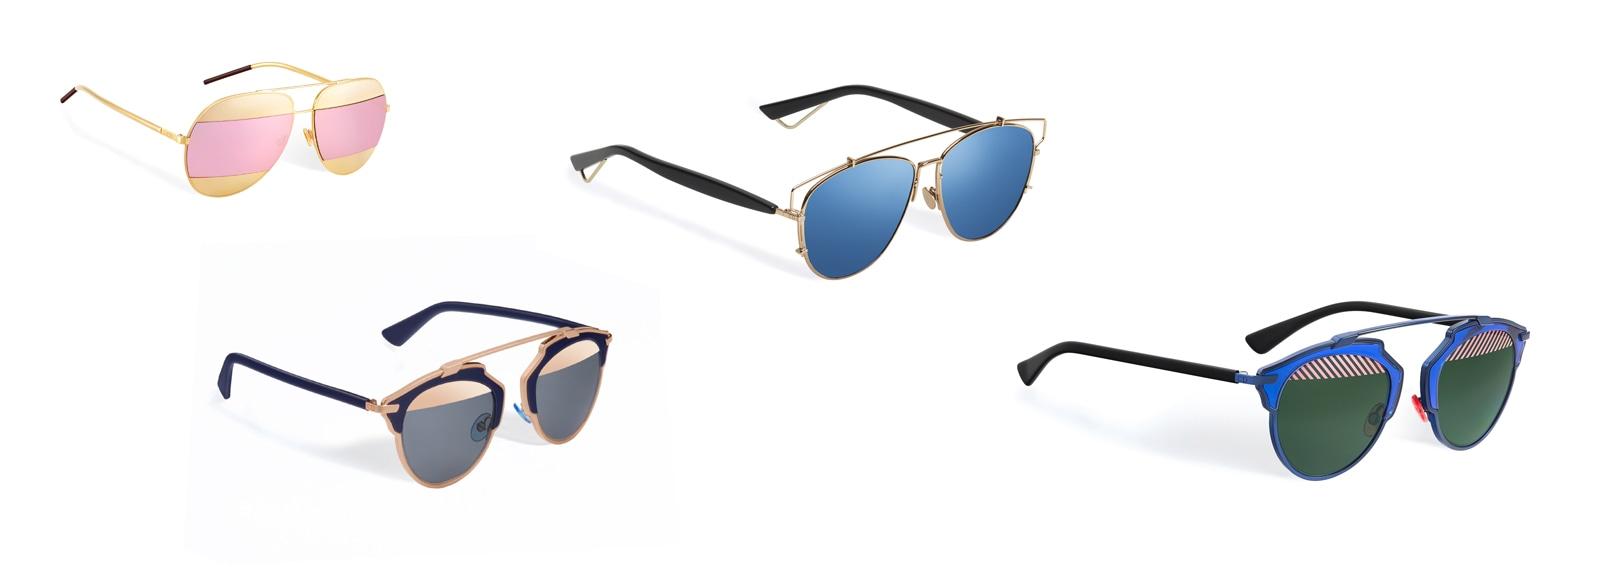 cover-dior-diorama-occhiali-dekstop